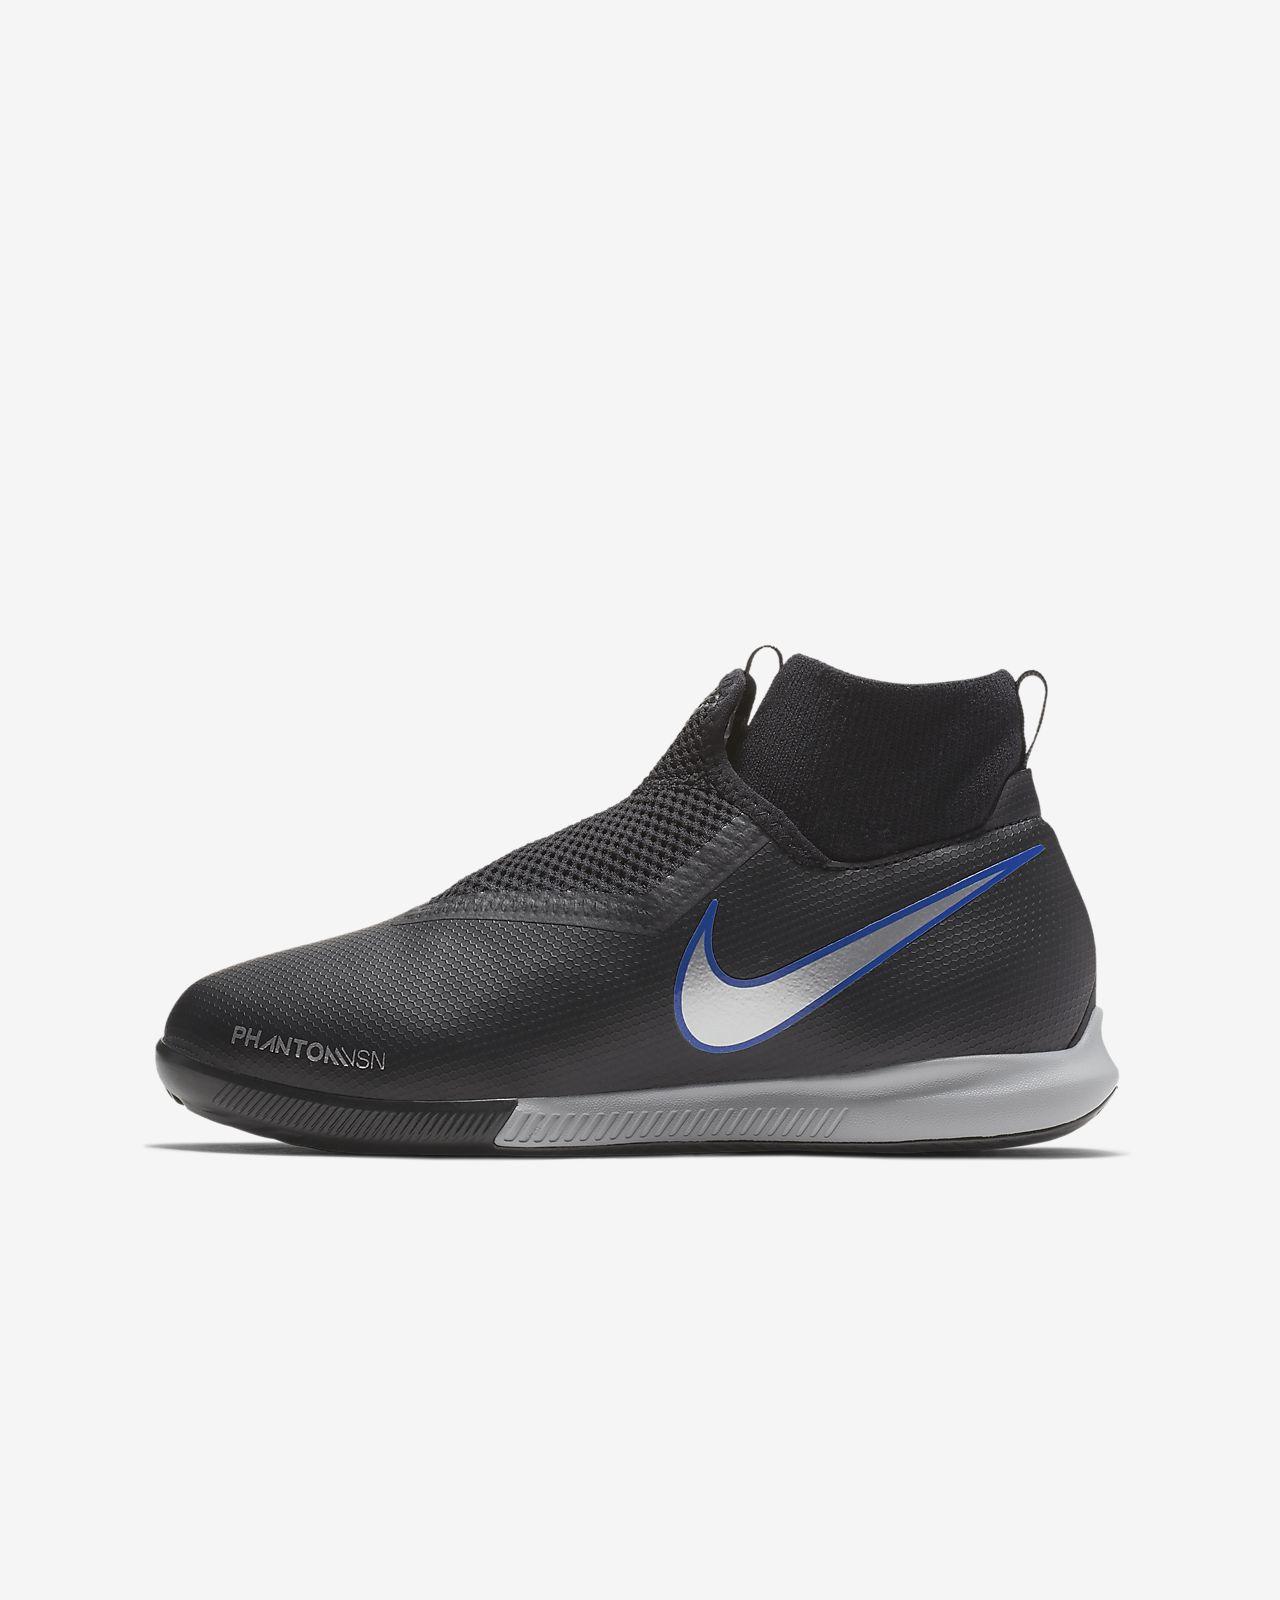 473a94ec84c ... Nike Jr. Phantom Vision Academy Dynamic Fit IC Kids  Indoor Court  Football Boot